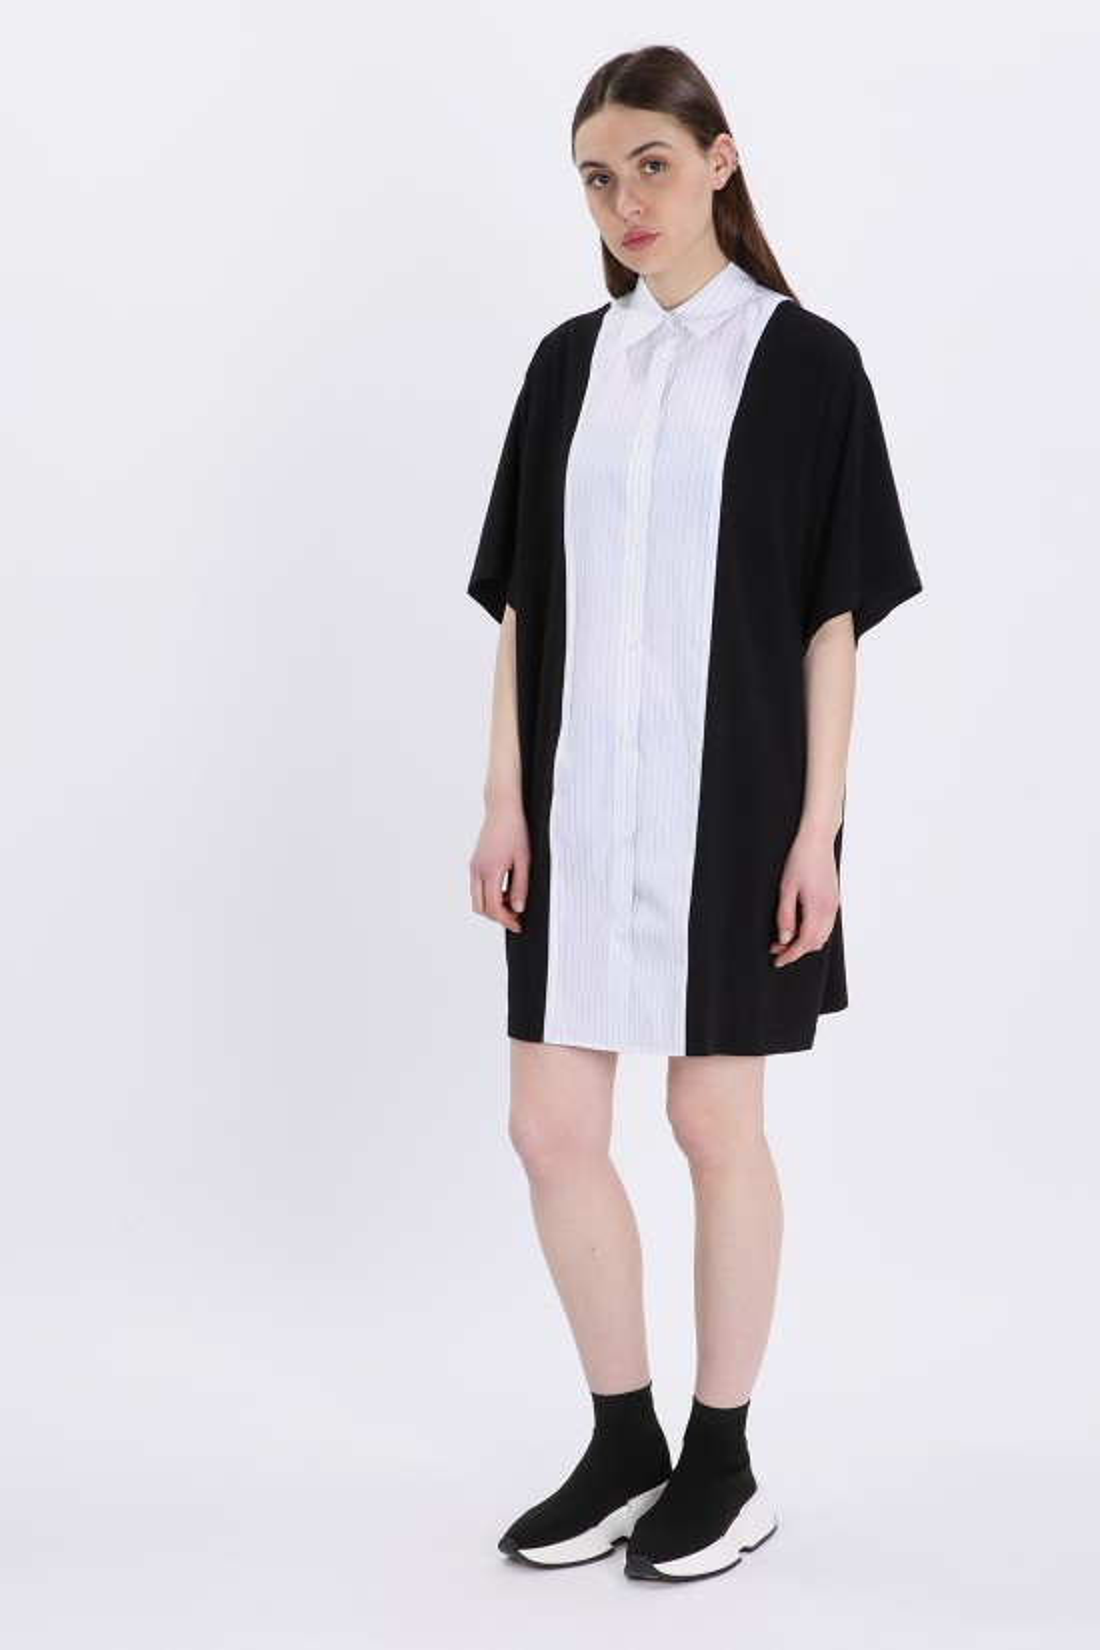 MM6 MAISON MARGIELA / Striped short dress Black